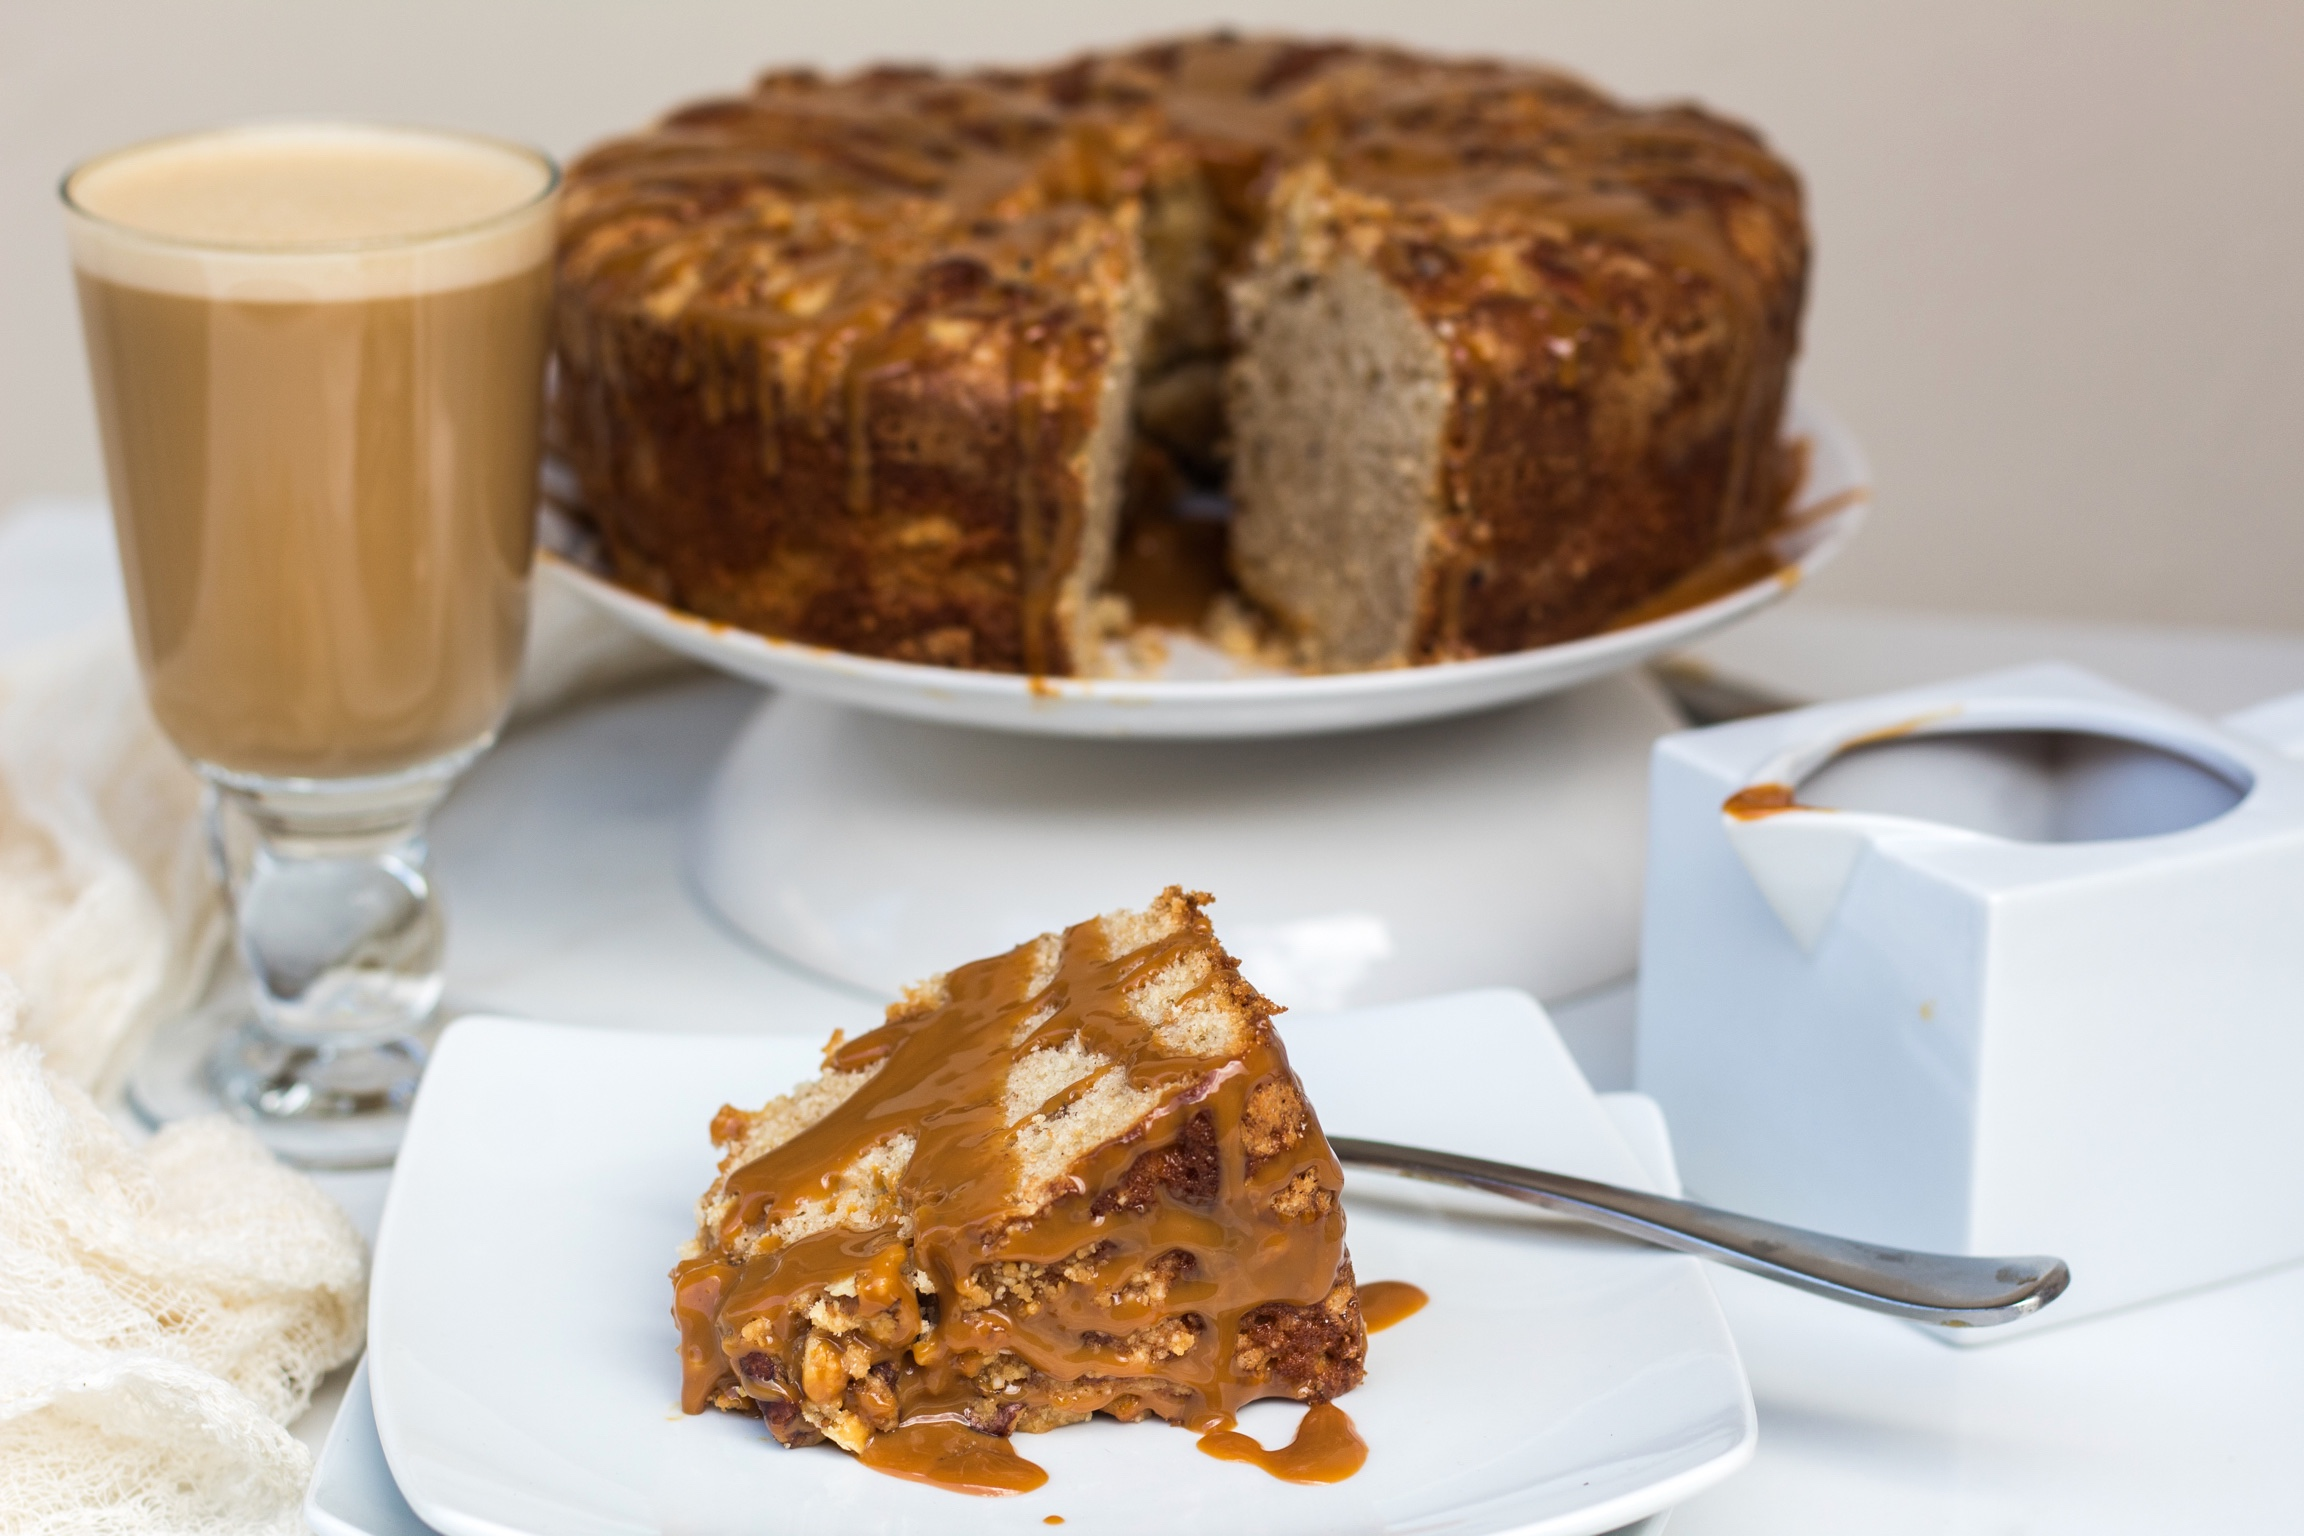 Spiced coffee cake